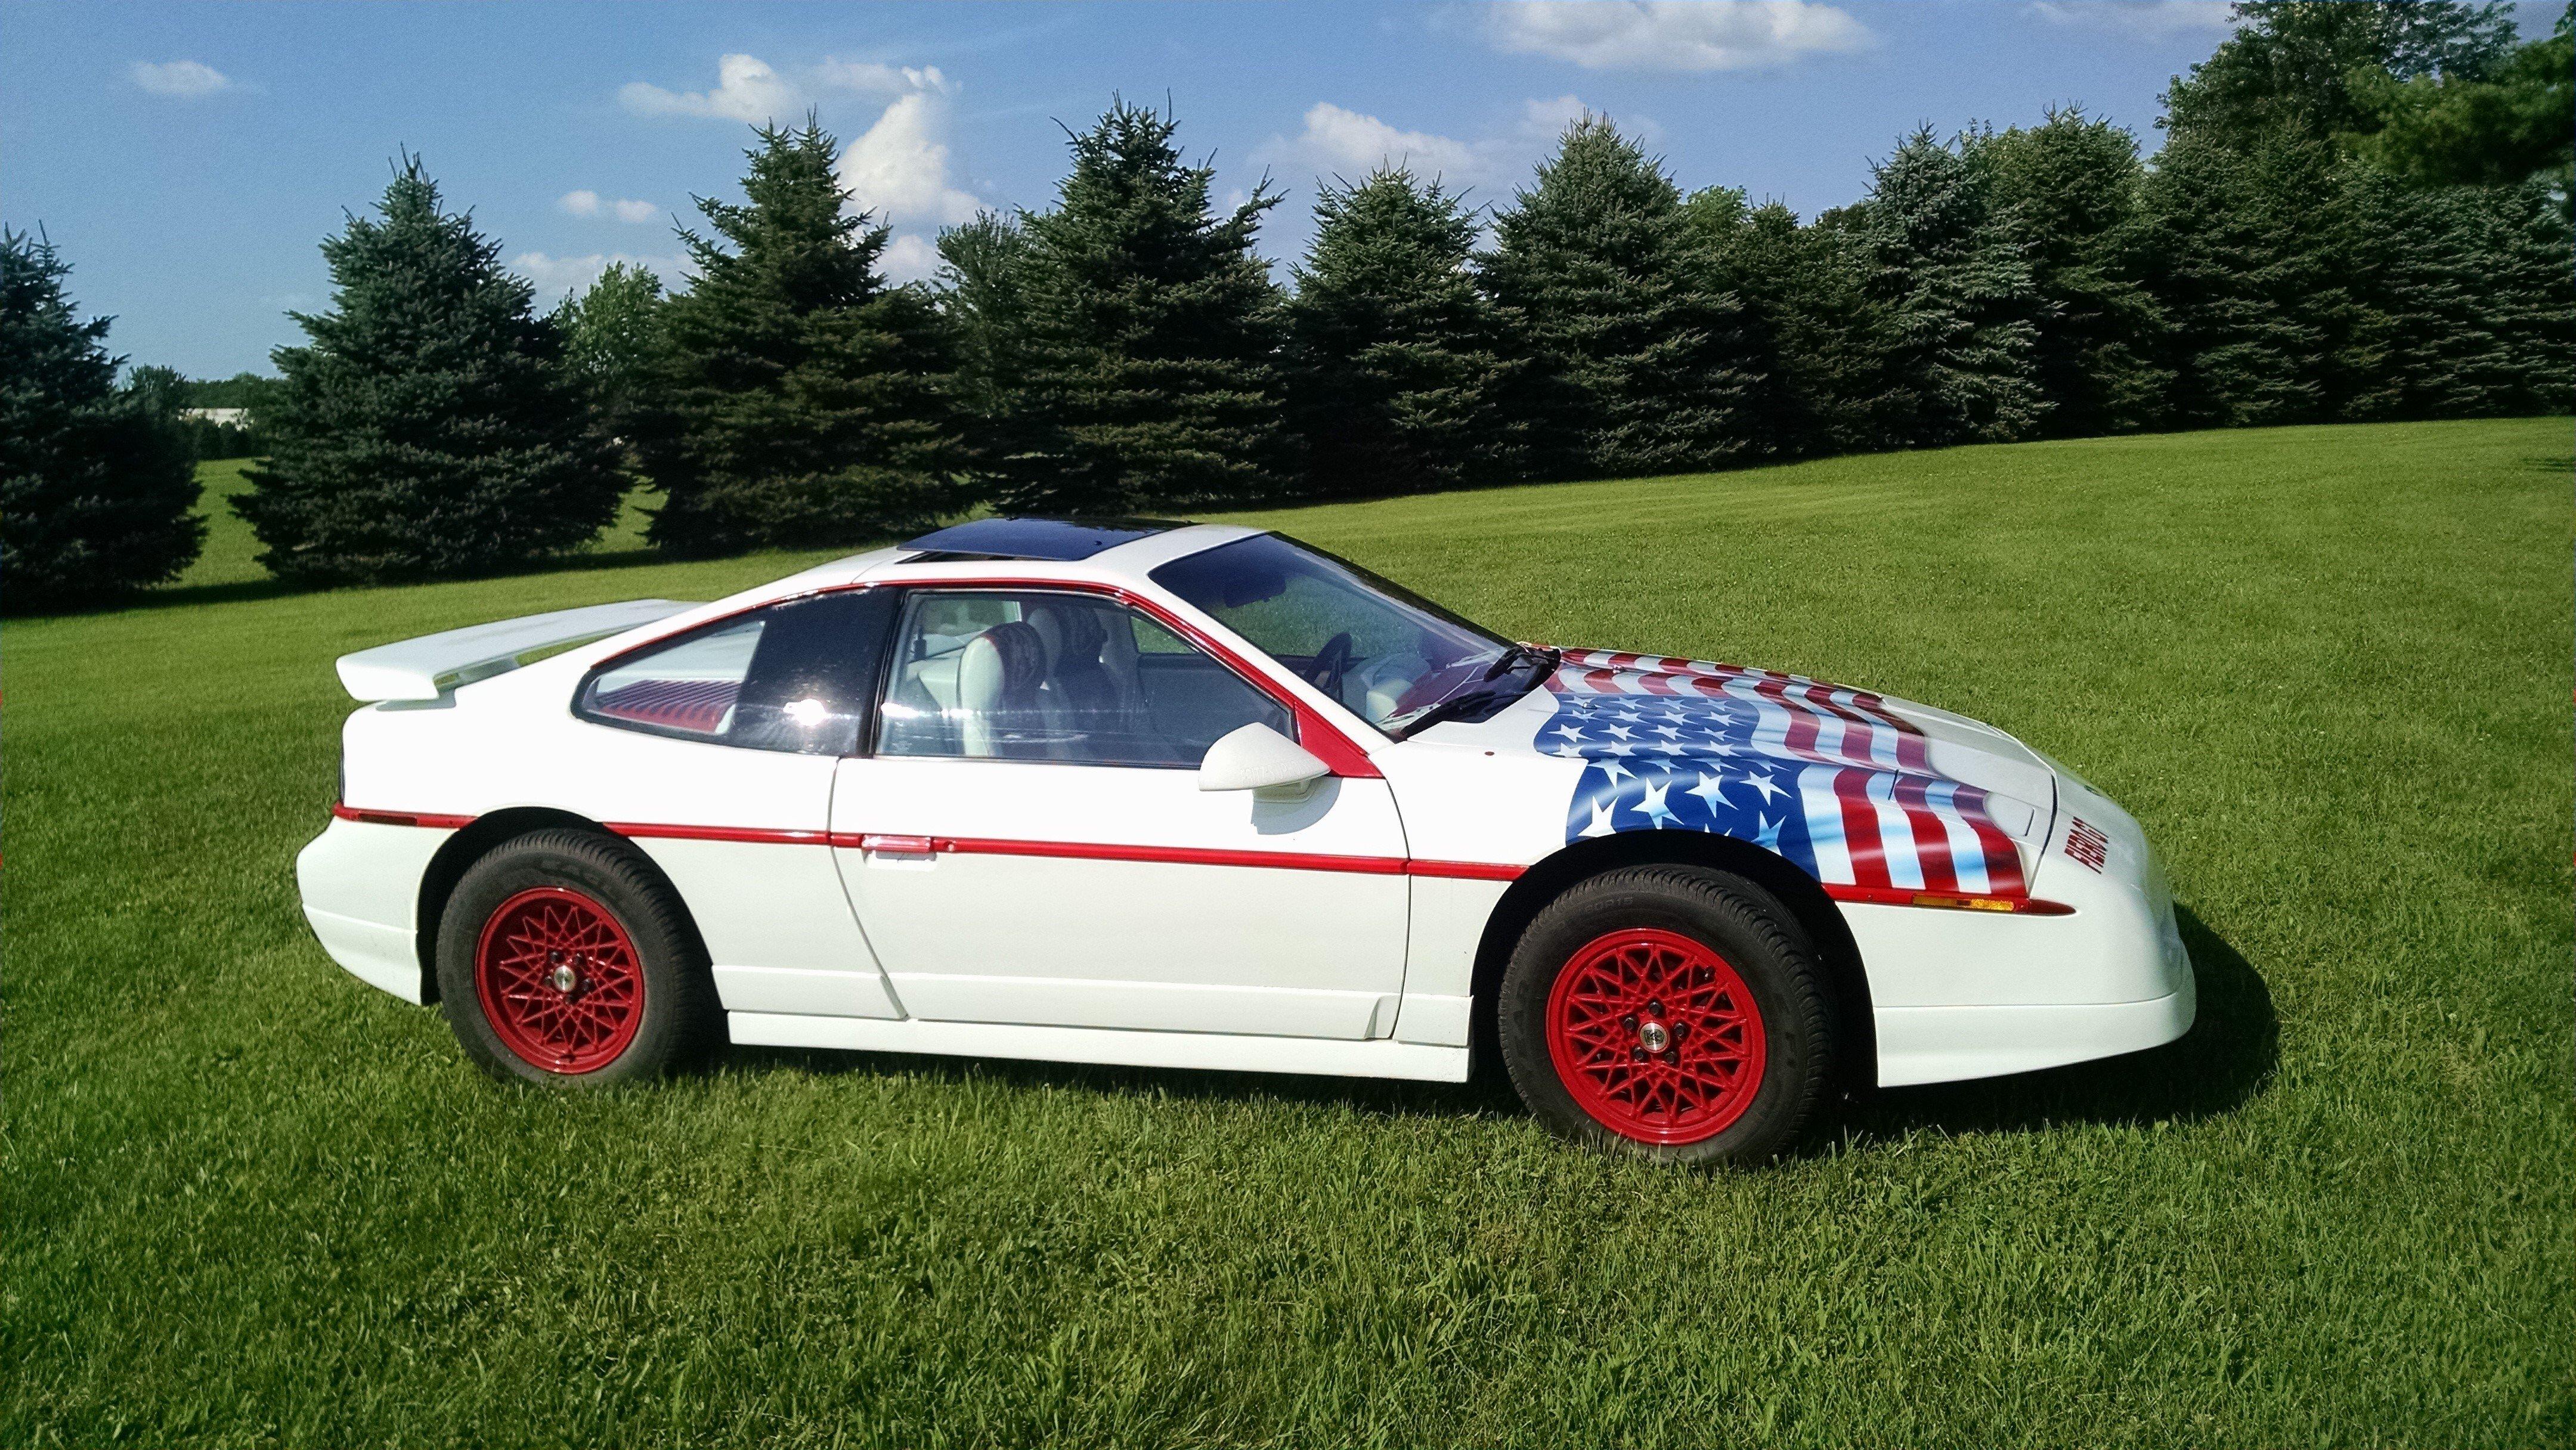 1988 Pontiac Fiero Gt For Sale Near Waynesburg Ohio 44688 Classics On Autotrader